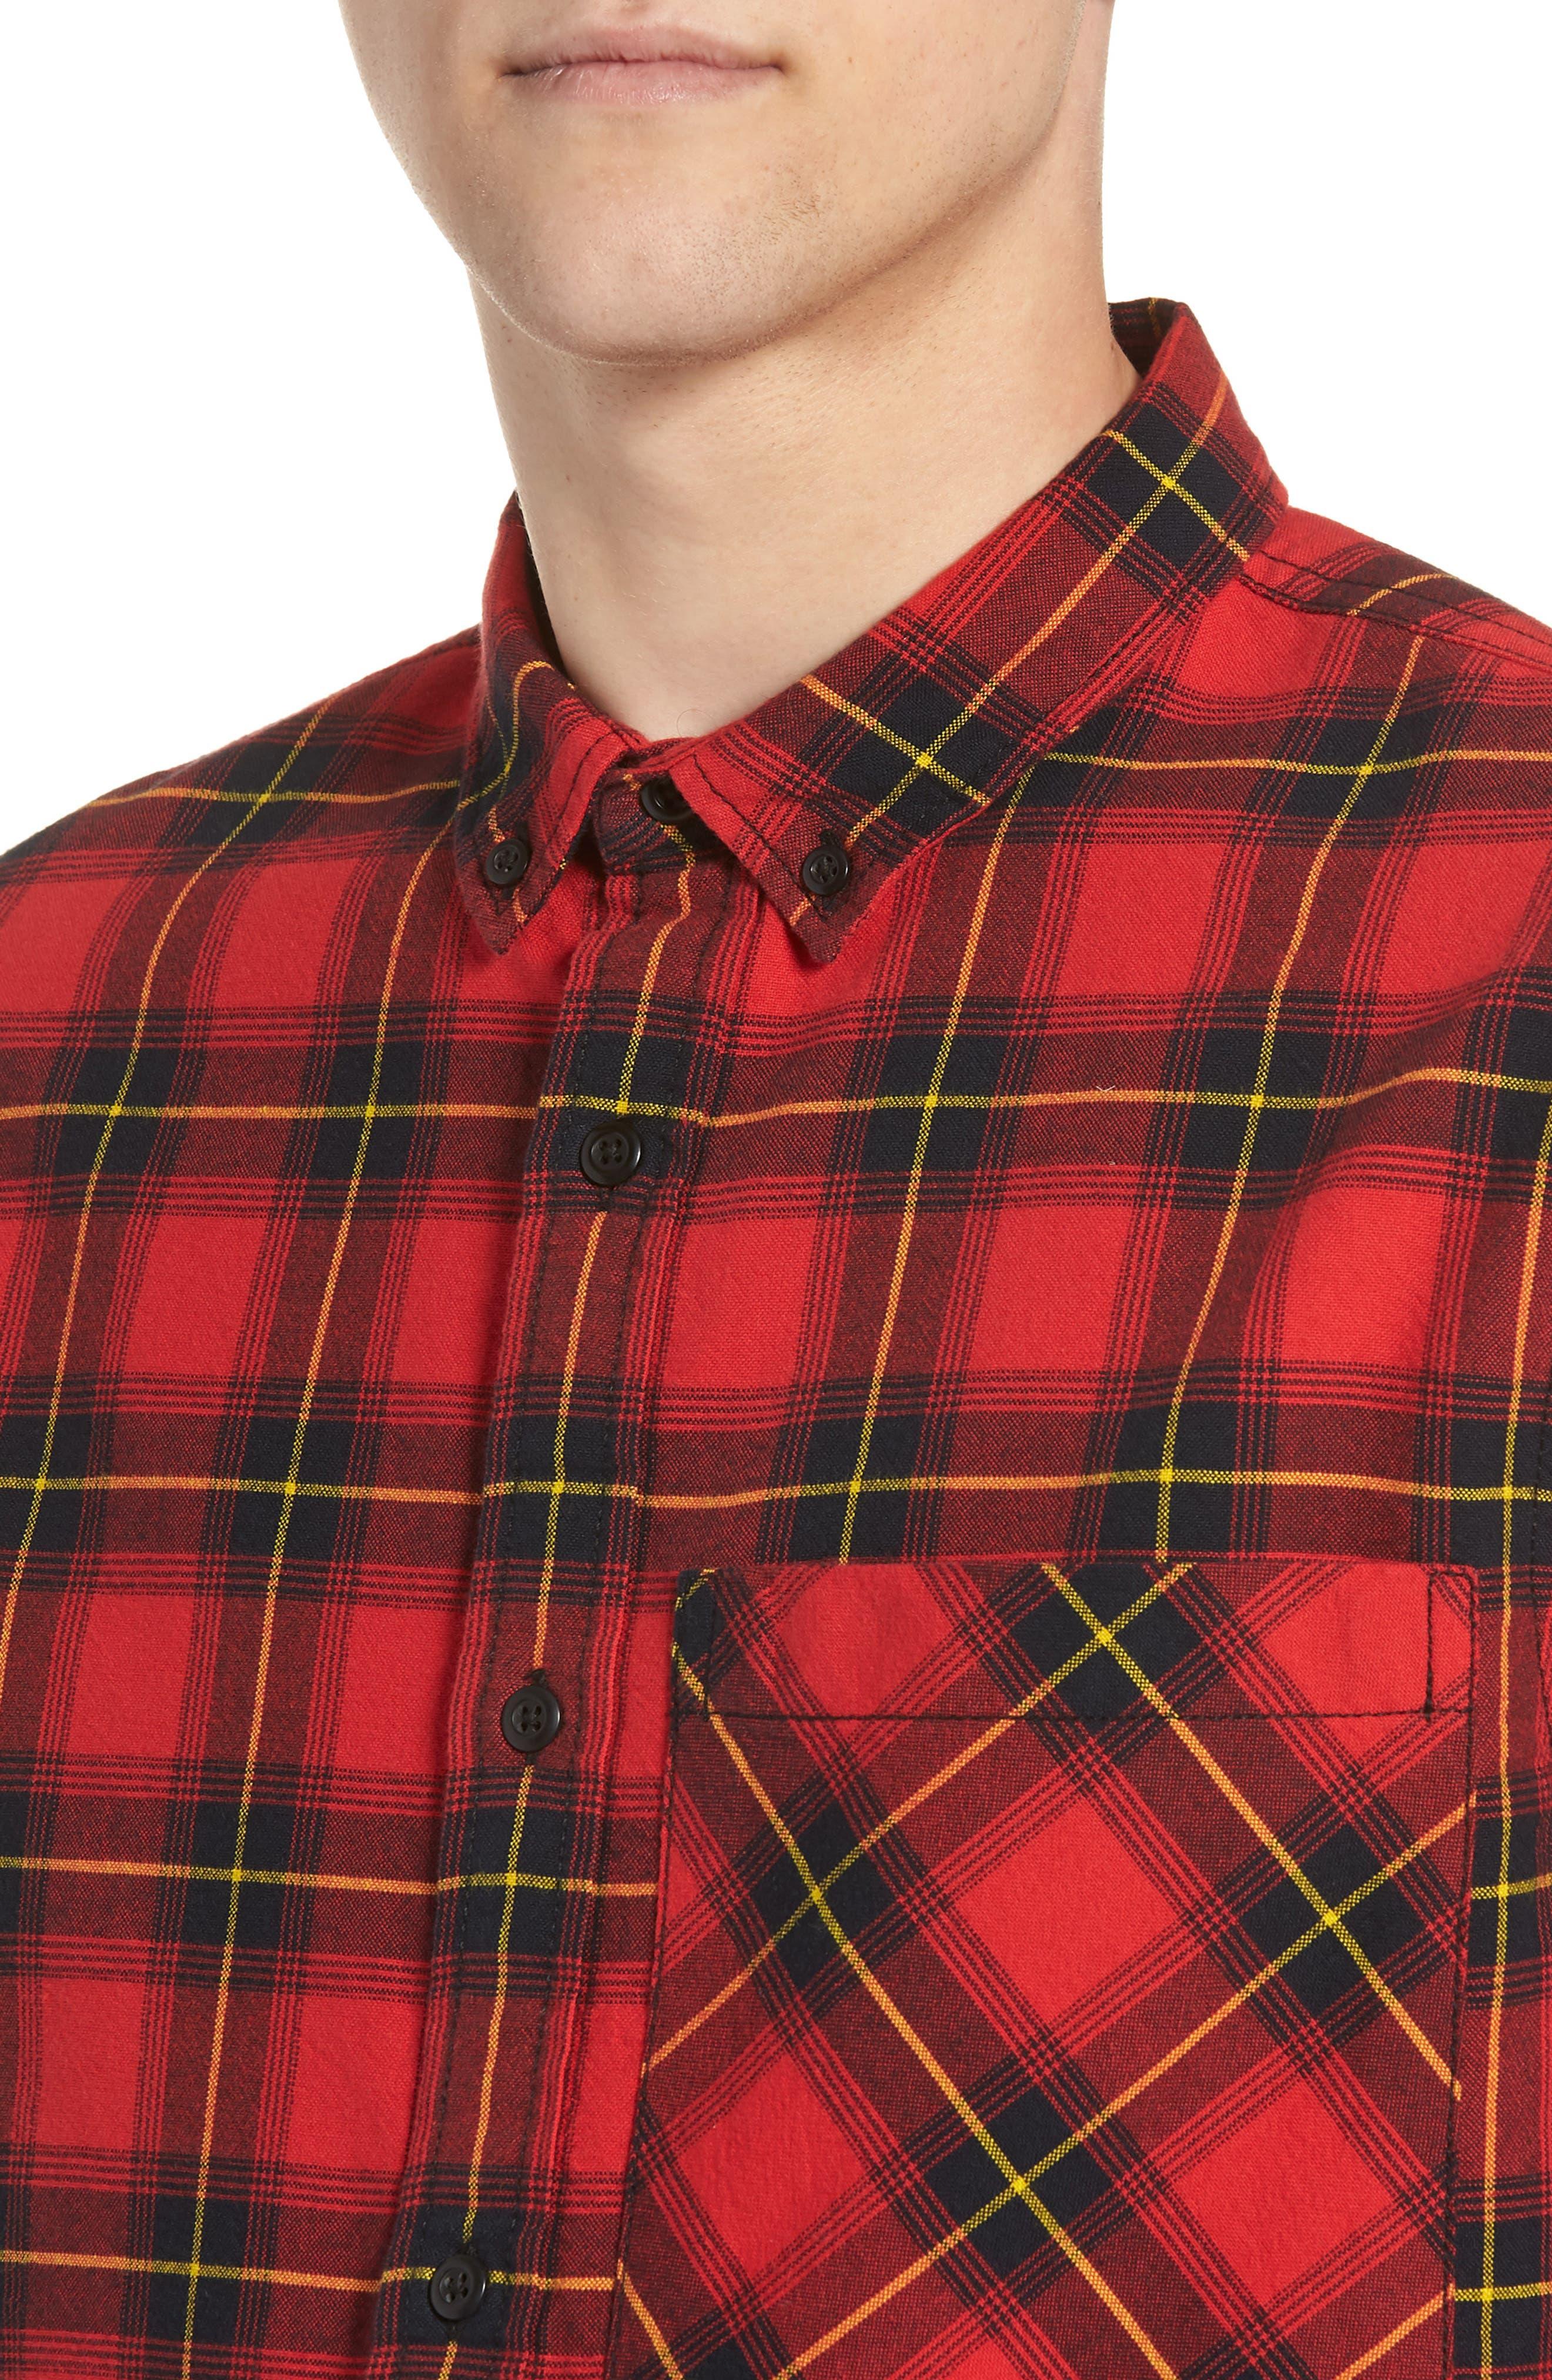 Plaid Oversize Pocket Sport Shirt,                             Alternate thumbnail 4, color,                             610